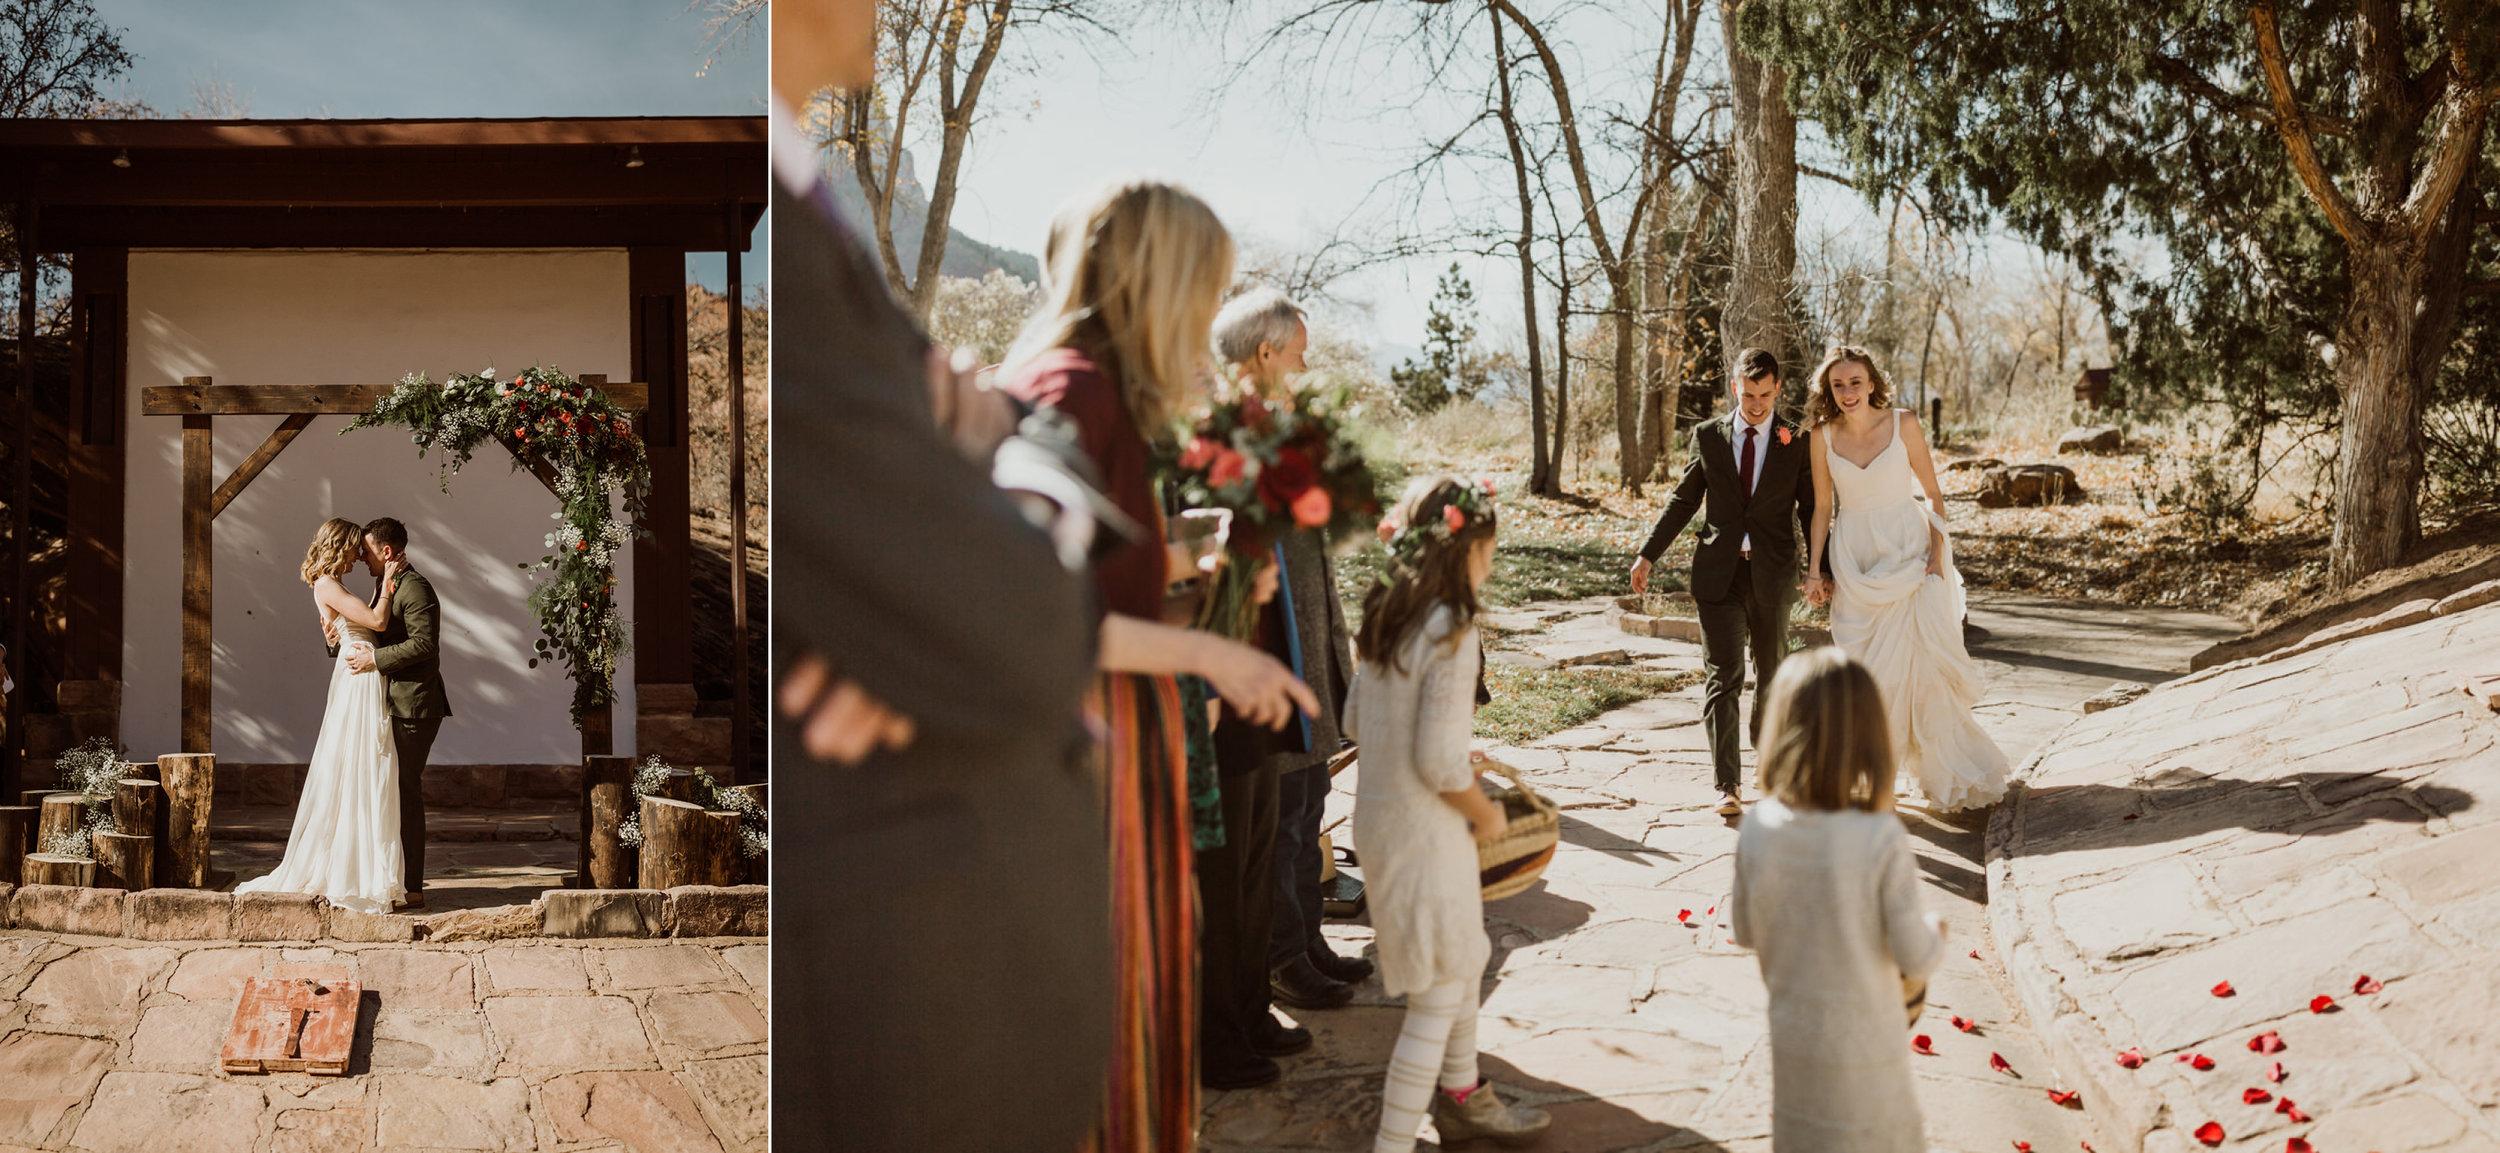 zion-national-park-wedding-162.jpg